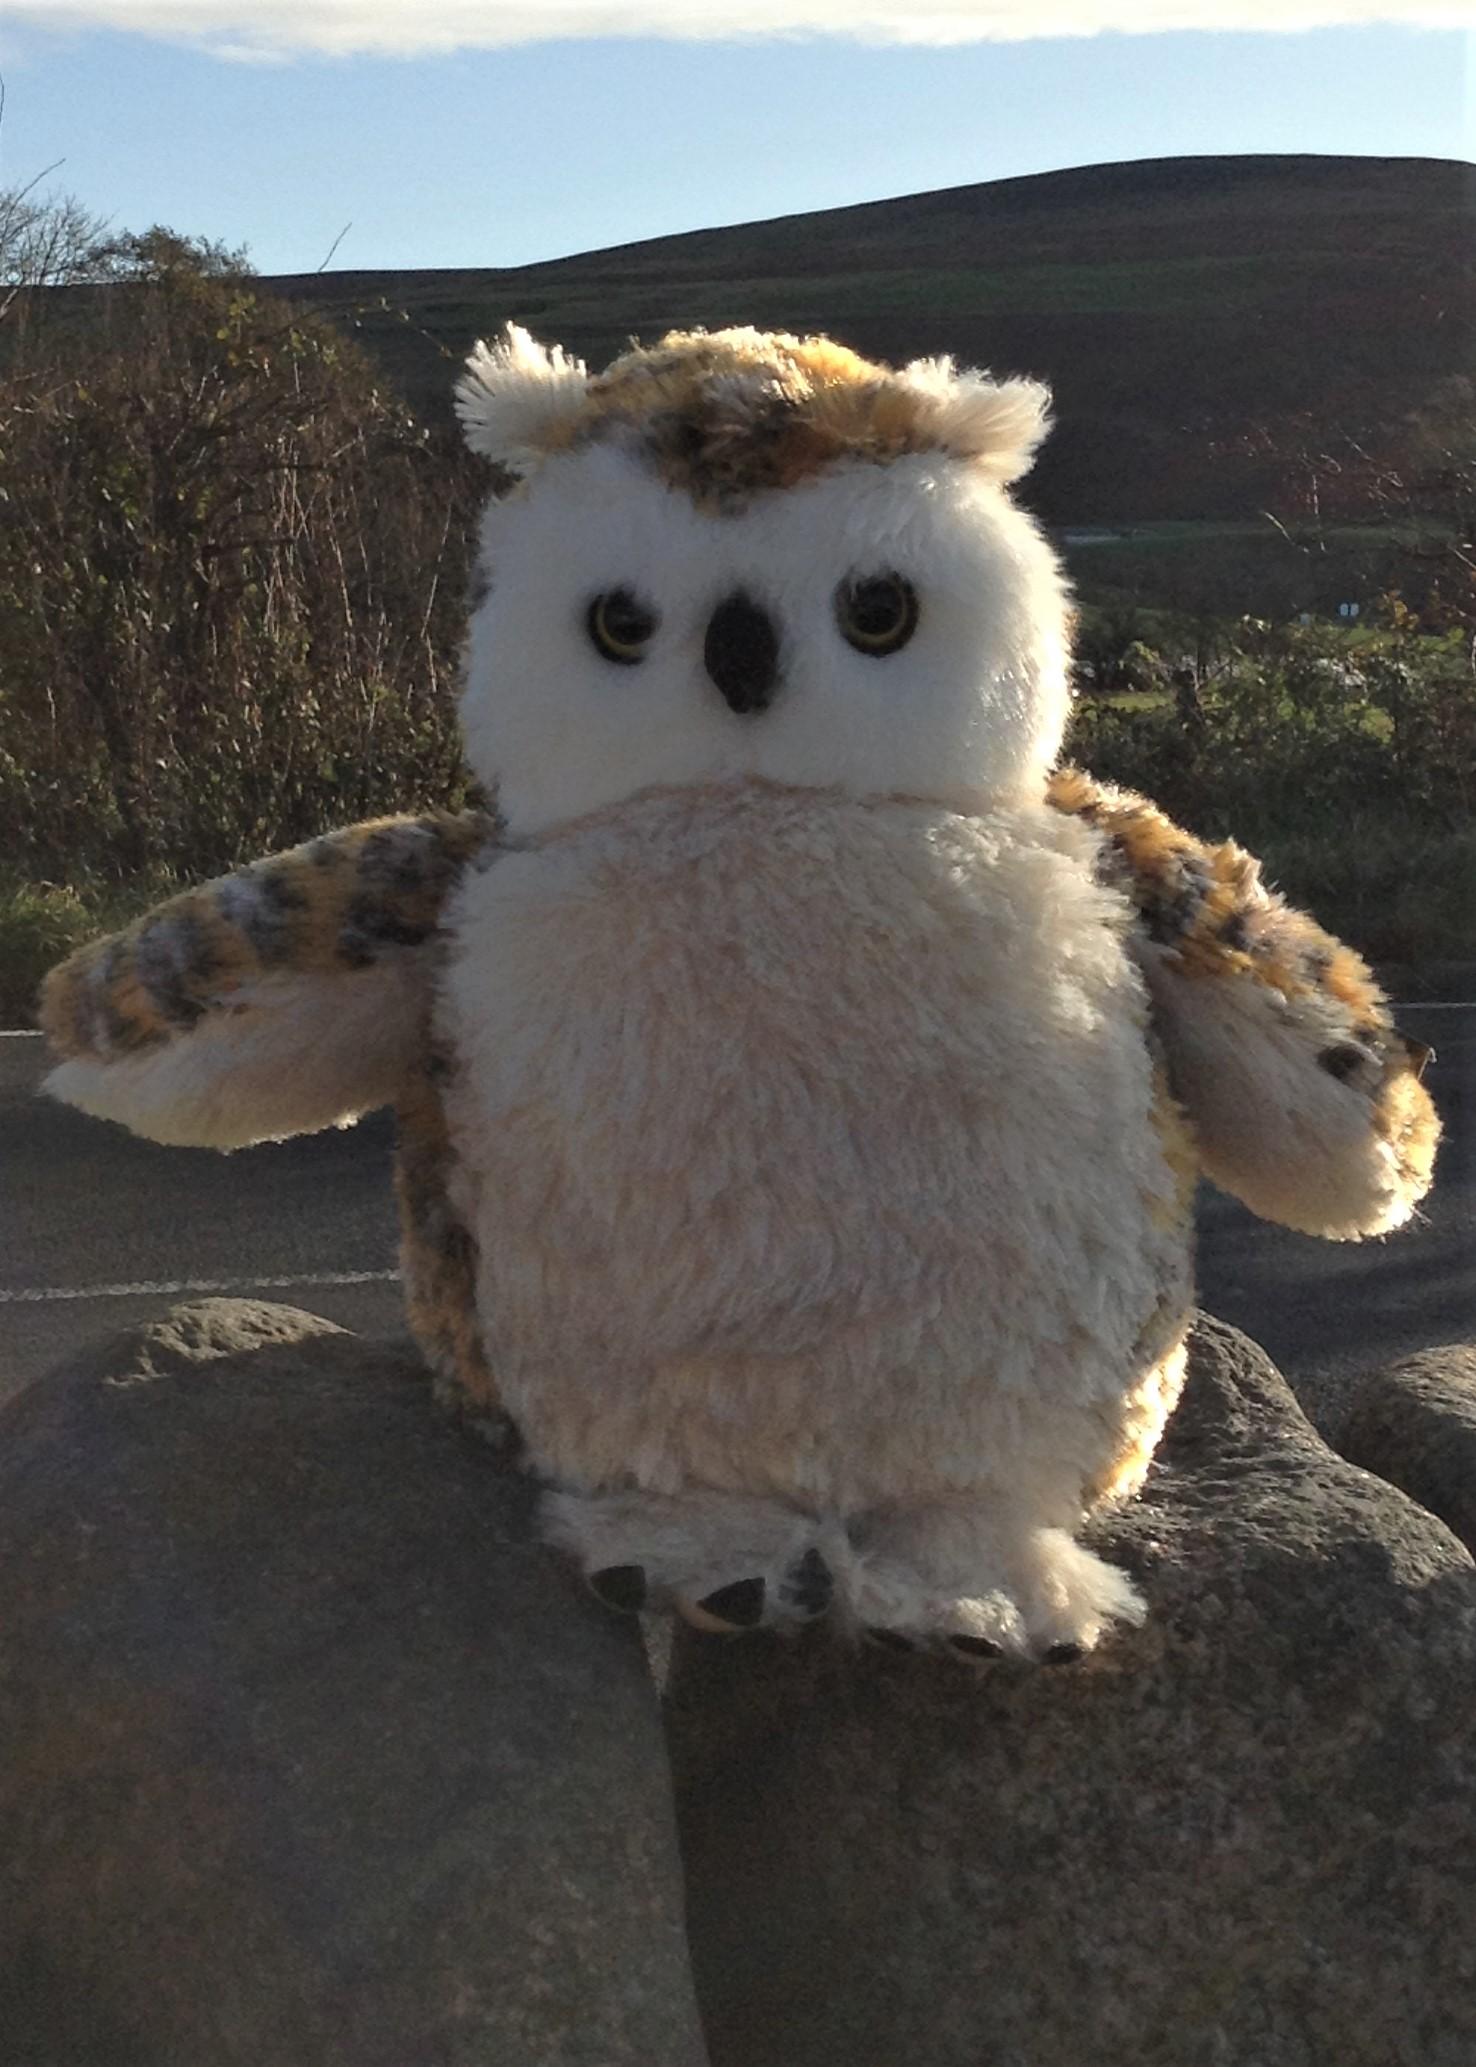 Large Fluffy Owl